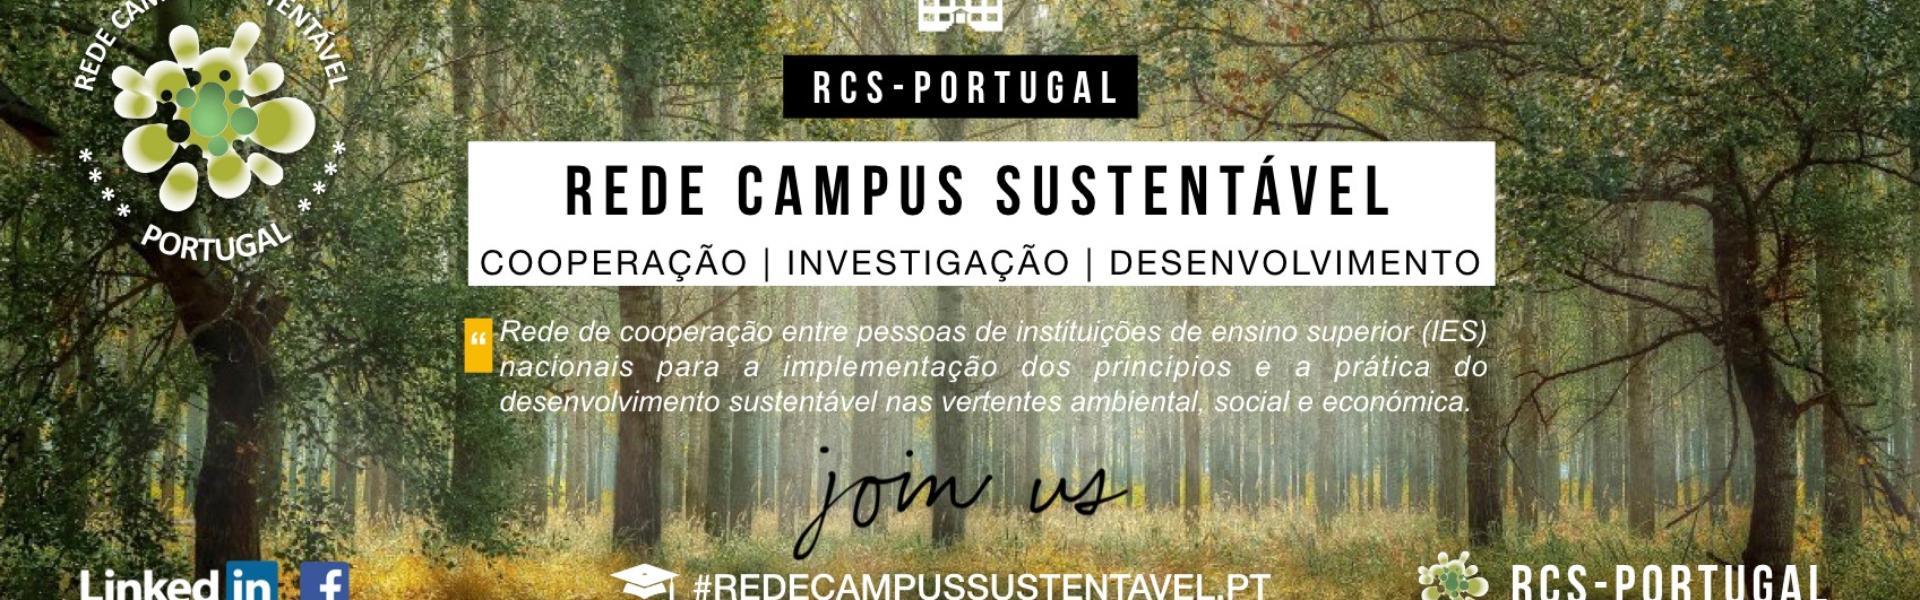 RCS - Rede Campus Sustentável, Portugal